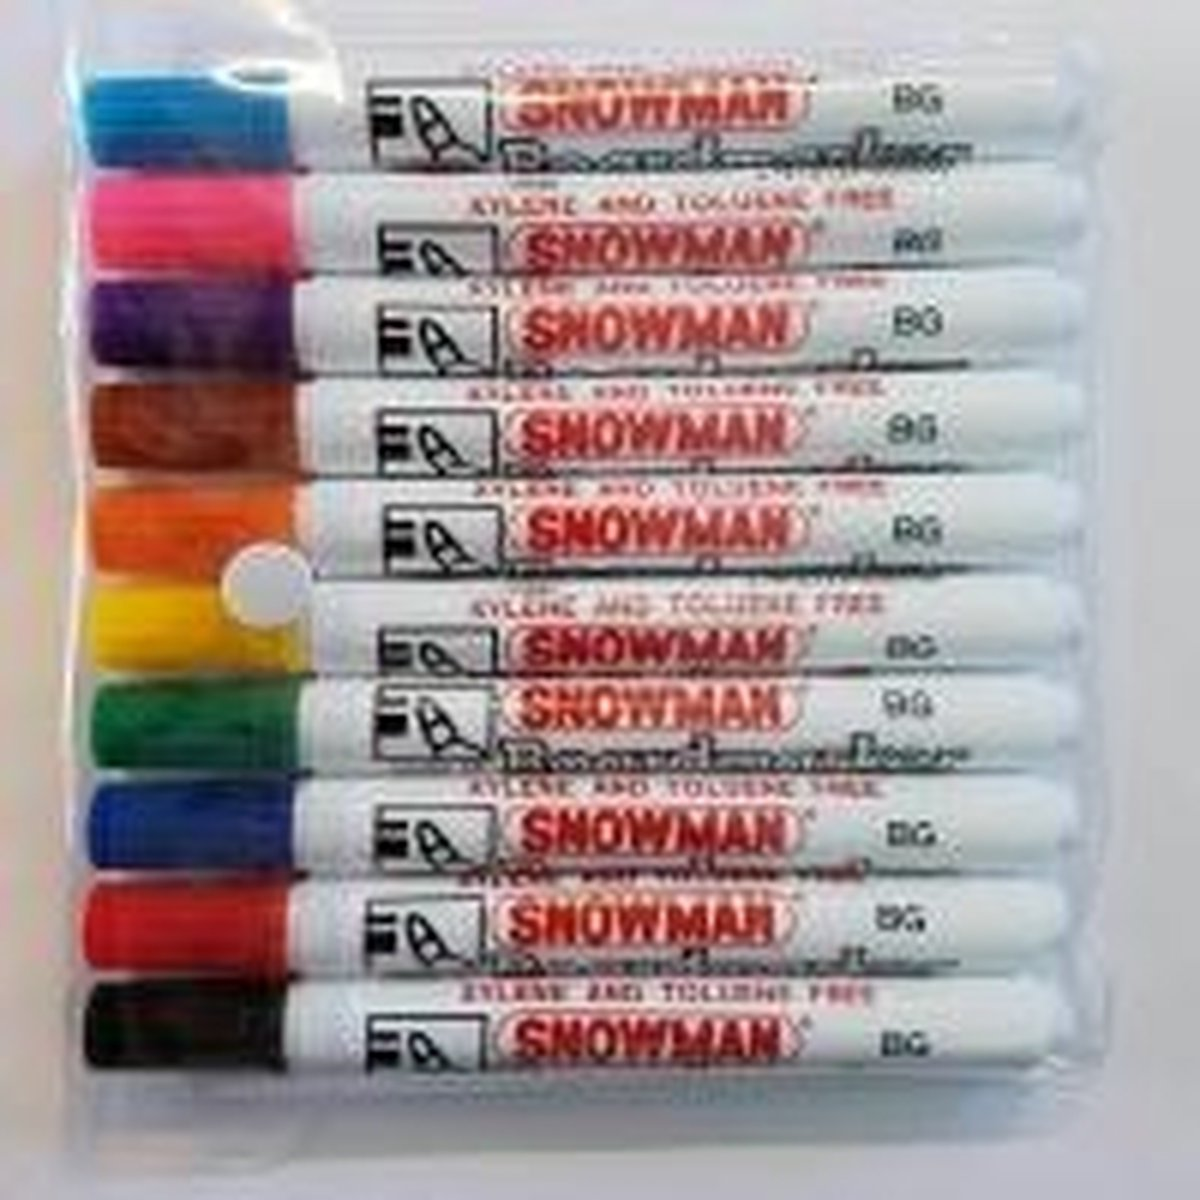 Snowman - BG-10 whitebord markers - assorti á 10 stuks, made in Japan - Snowman